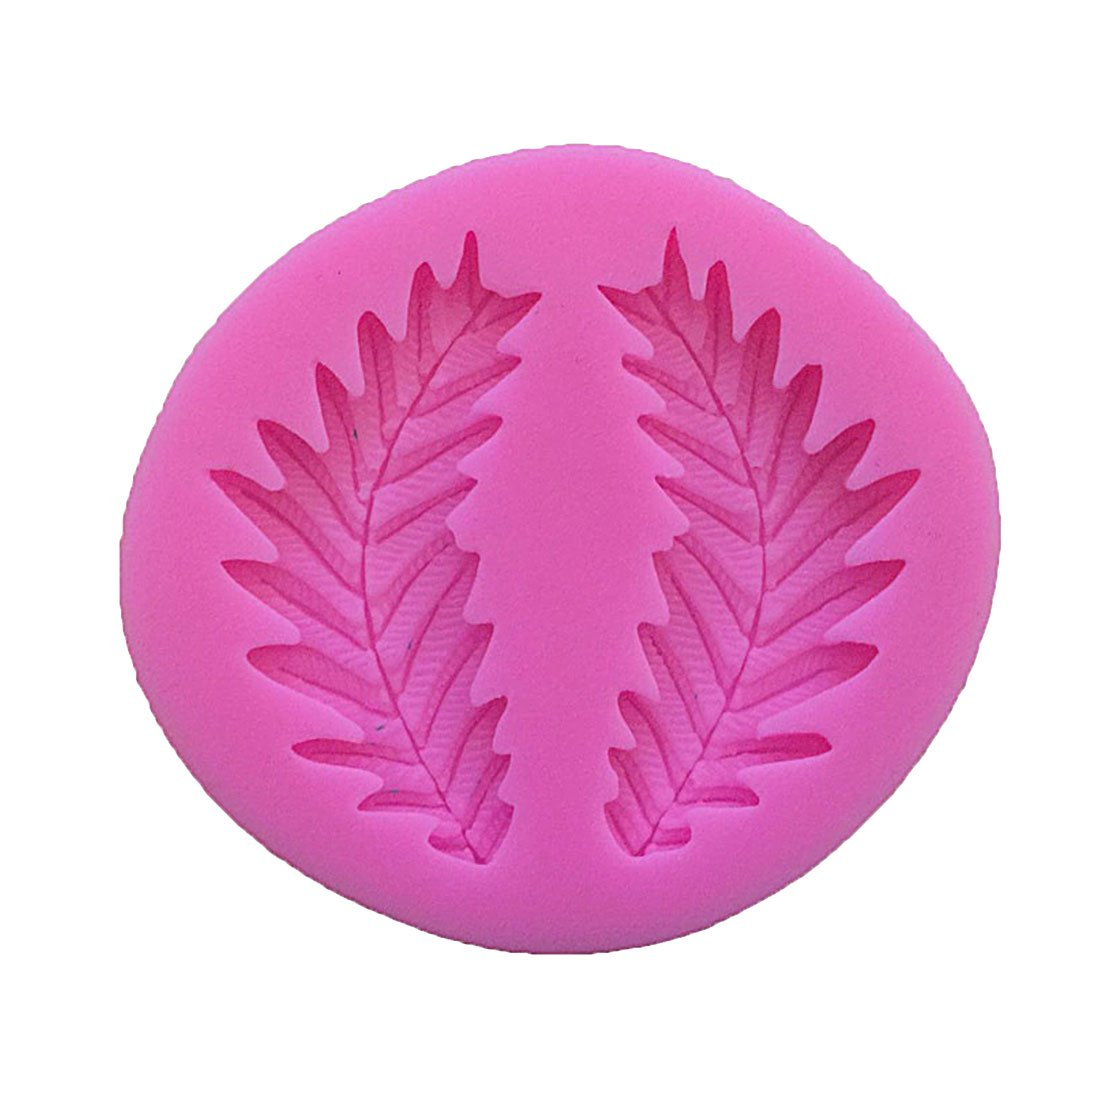 joyliveCY Hojas de arce Compatible Conma Silicona Fondant molde Chocolate molde para hornear